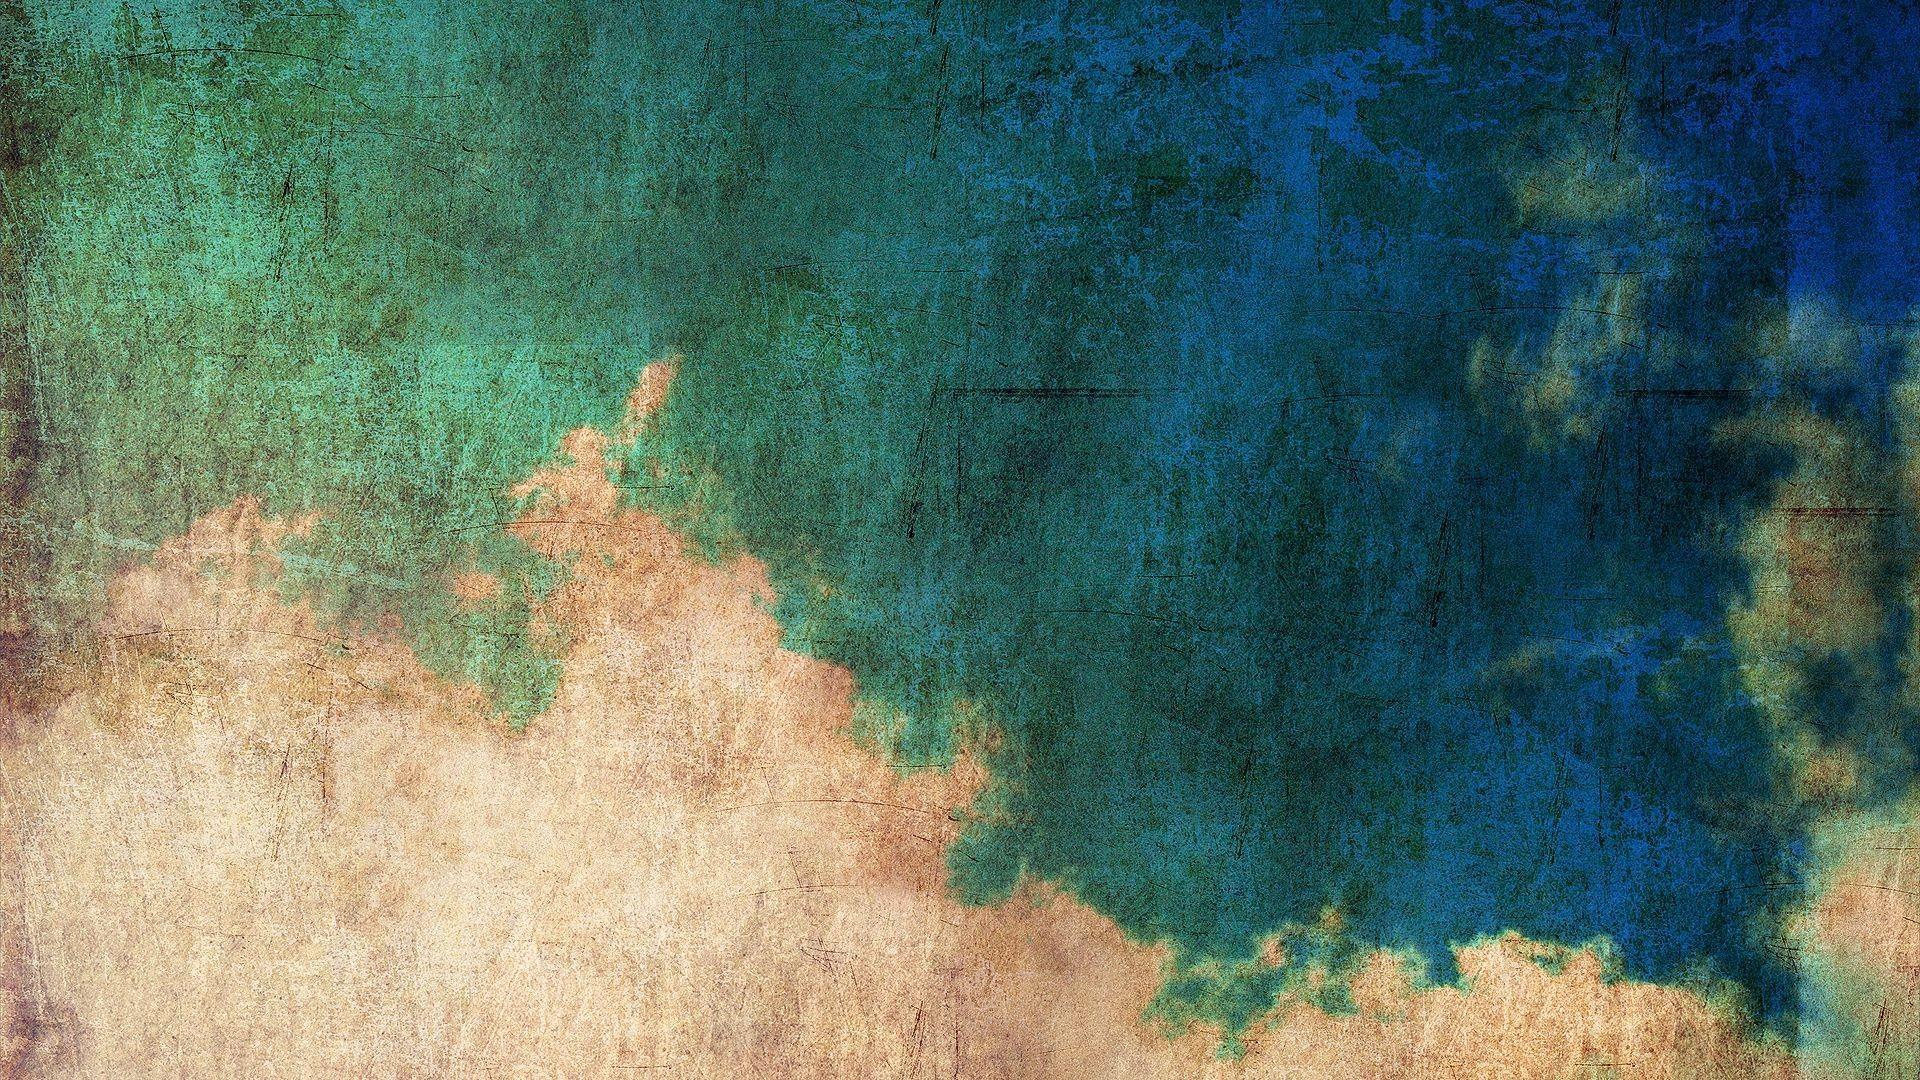 Glock Iphone Wallpaper Wallpaper Vintage 183 ① Download Free Stunning Backgrounds